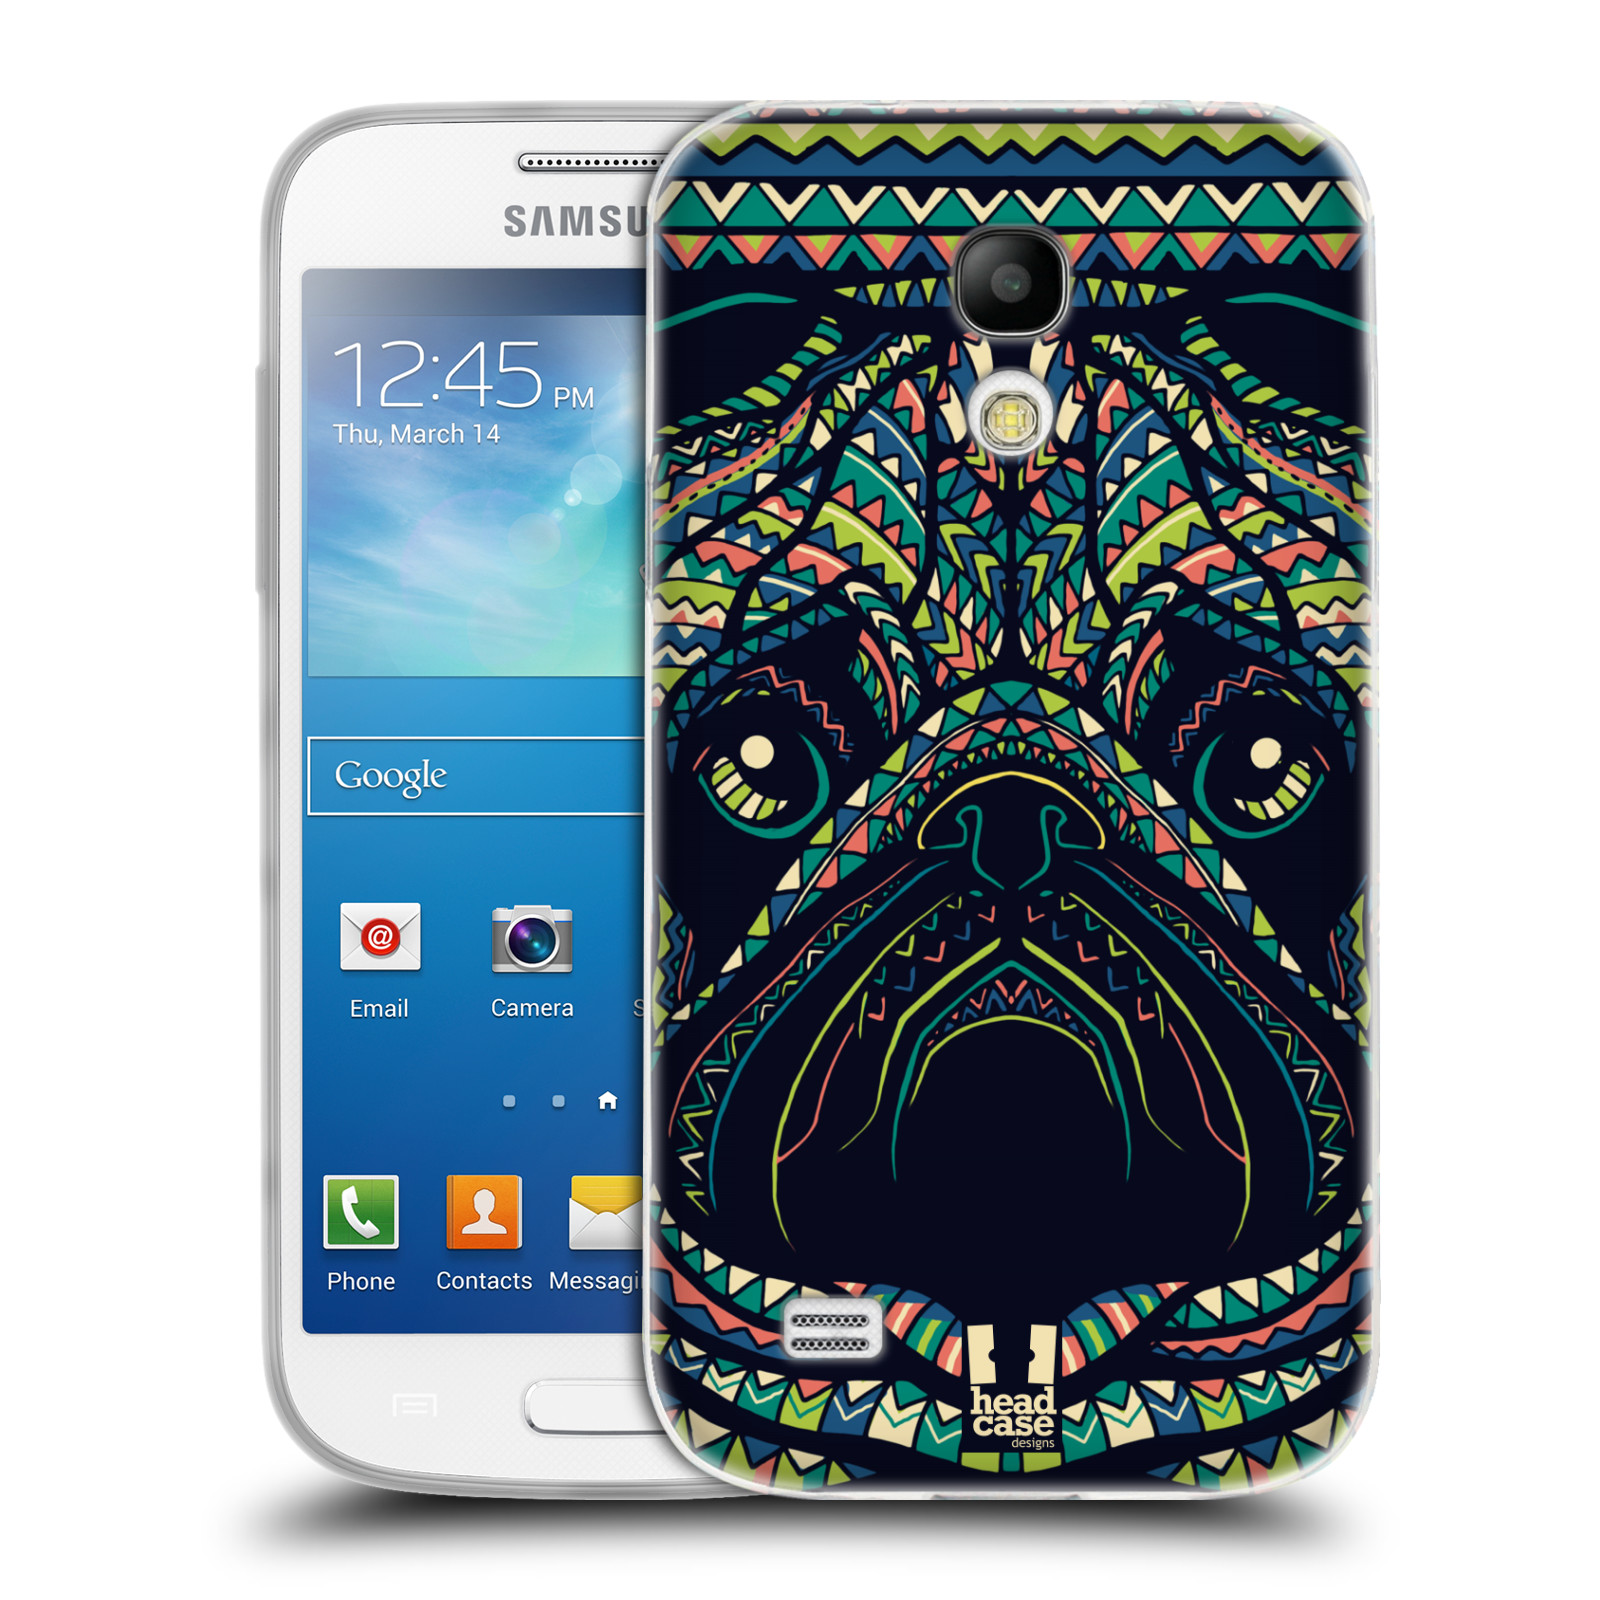 HEAD CASE silikonový obal na mobil Samsung Galaxy S4 MINI vzor Aztécký motiv zvíře 3 mopsík